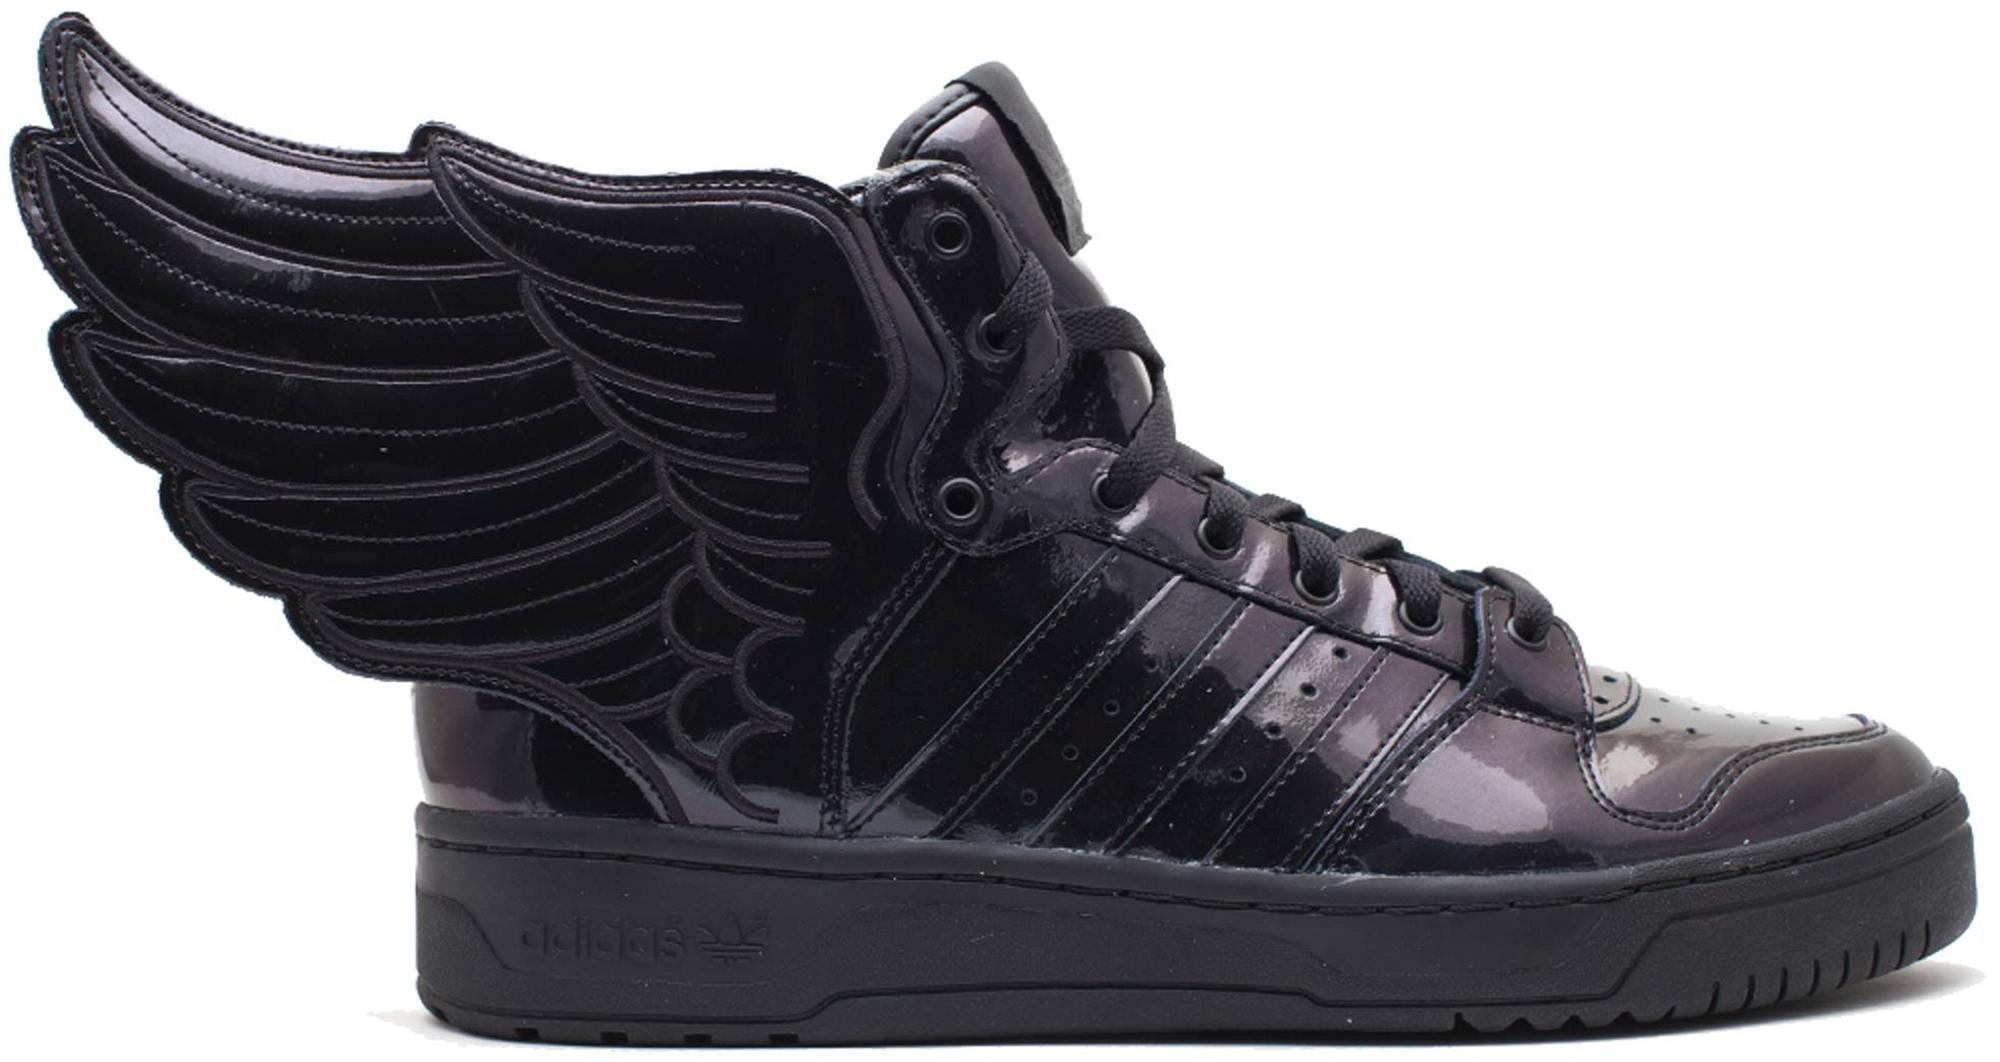 adidas JS Wings 2.0 Black Patent - Q23668